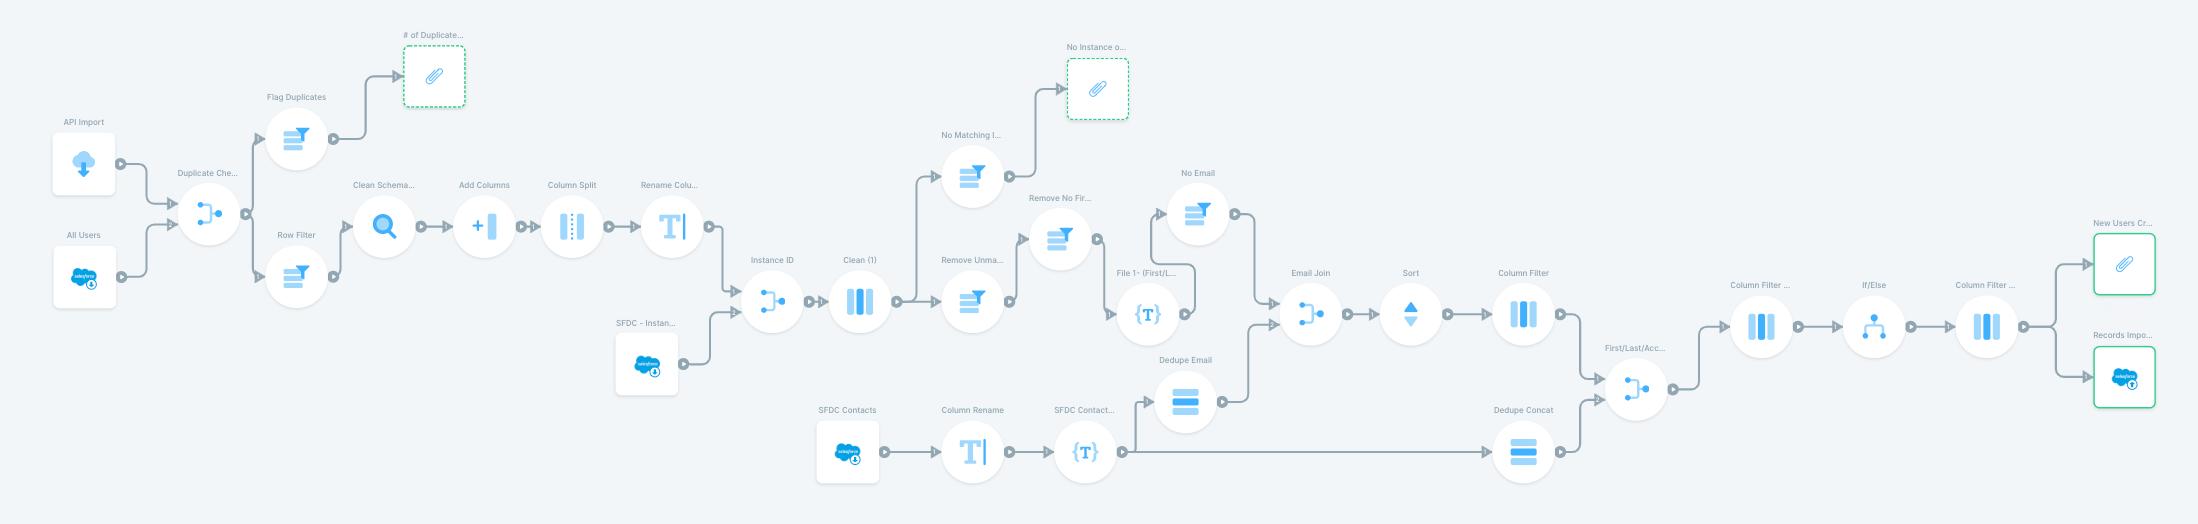 Push Pendo.io user data to Salesforce